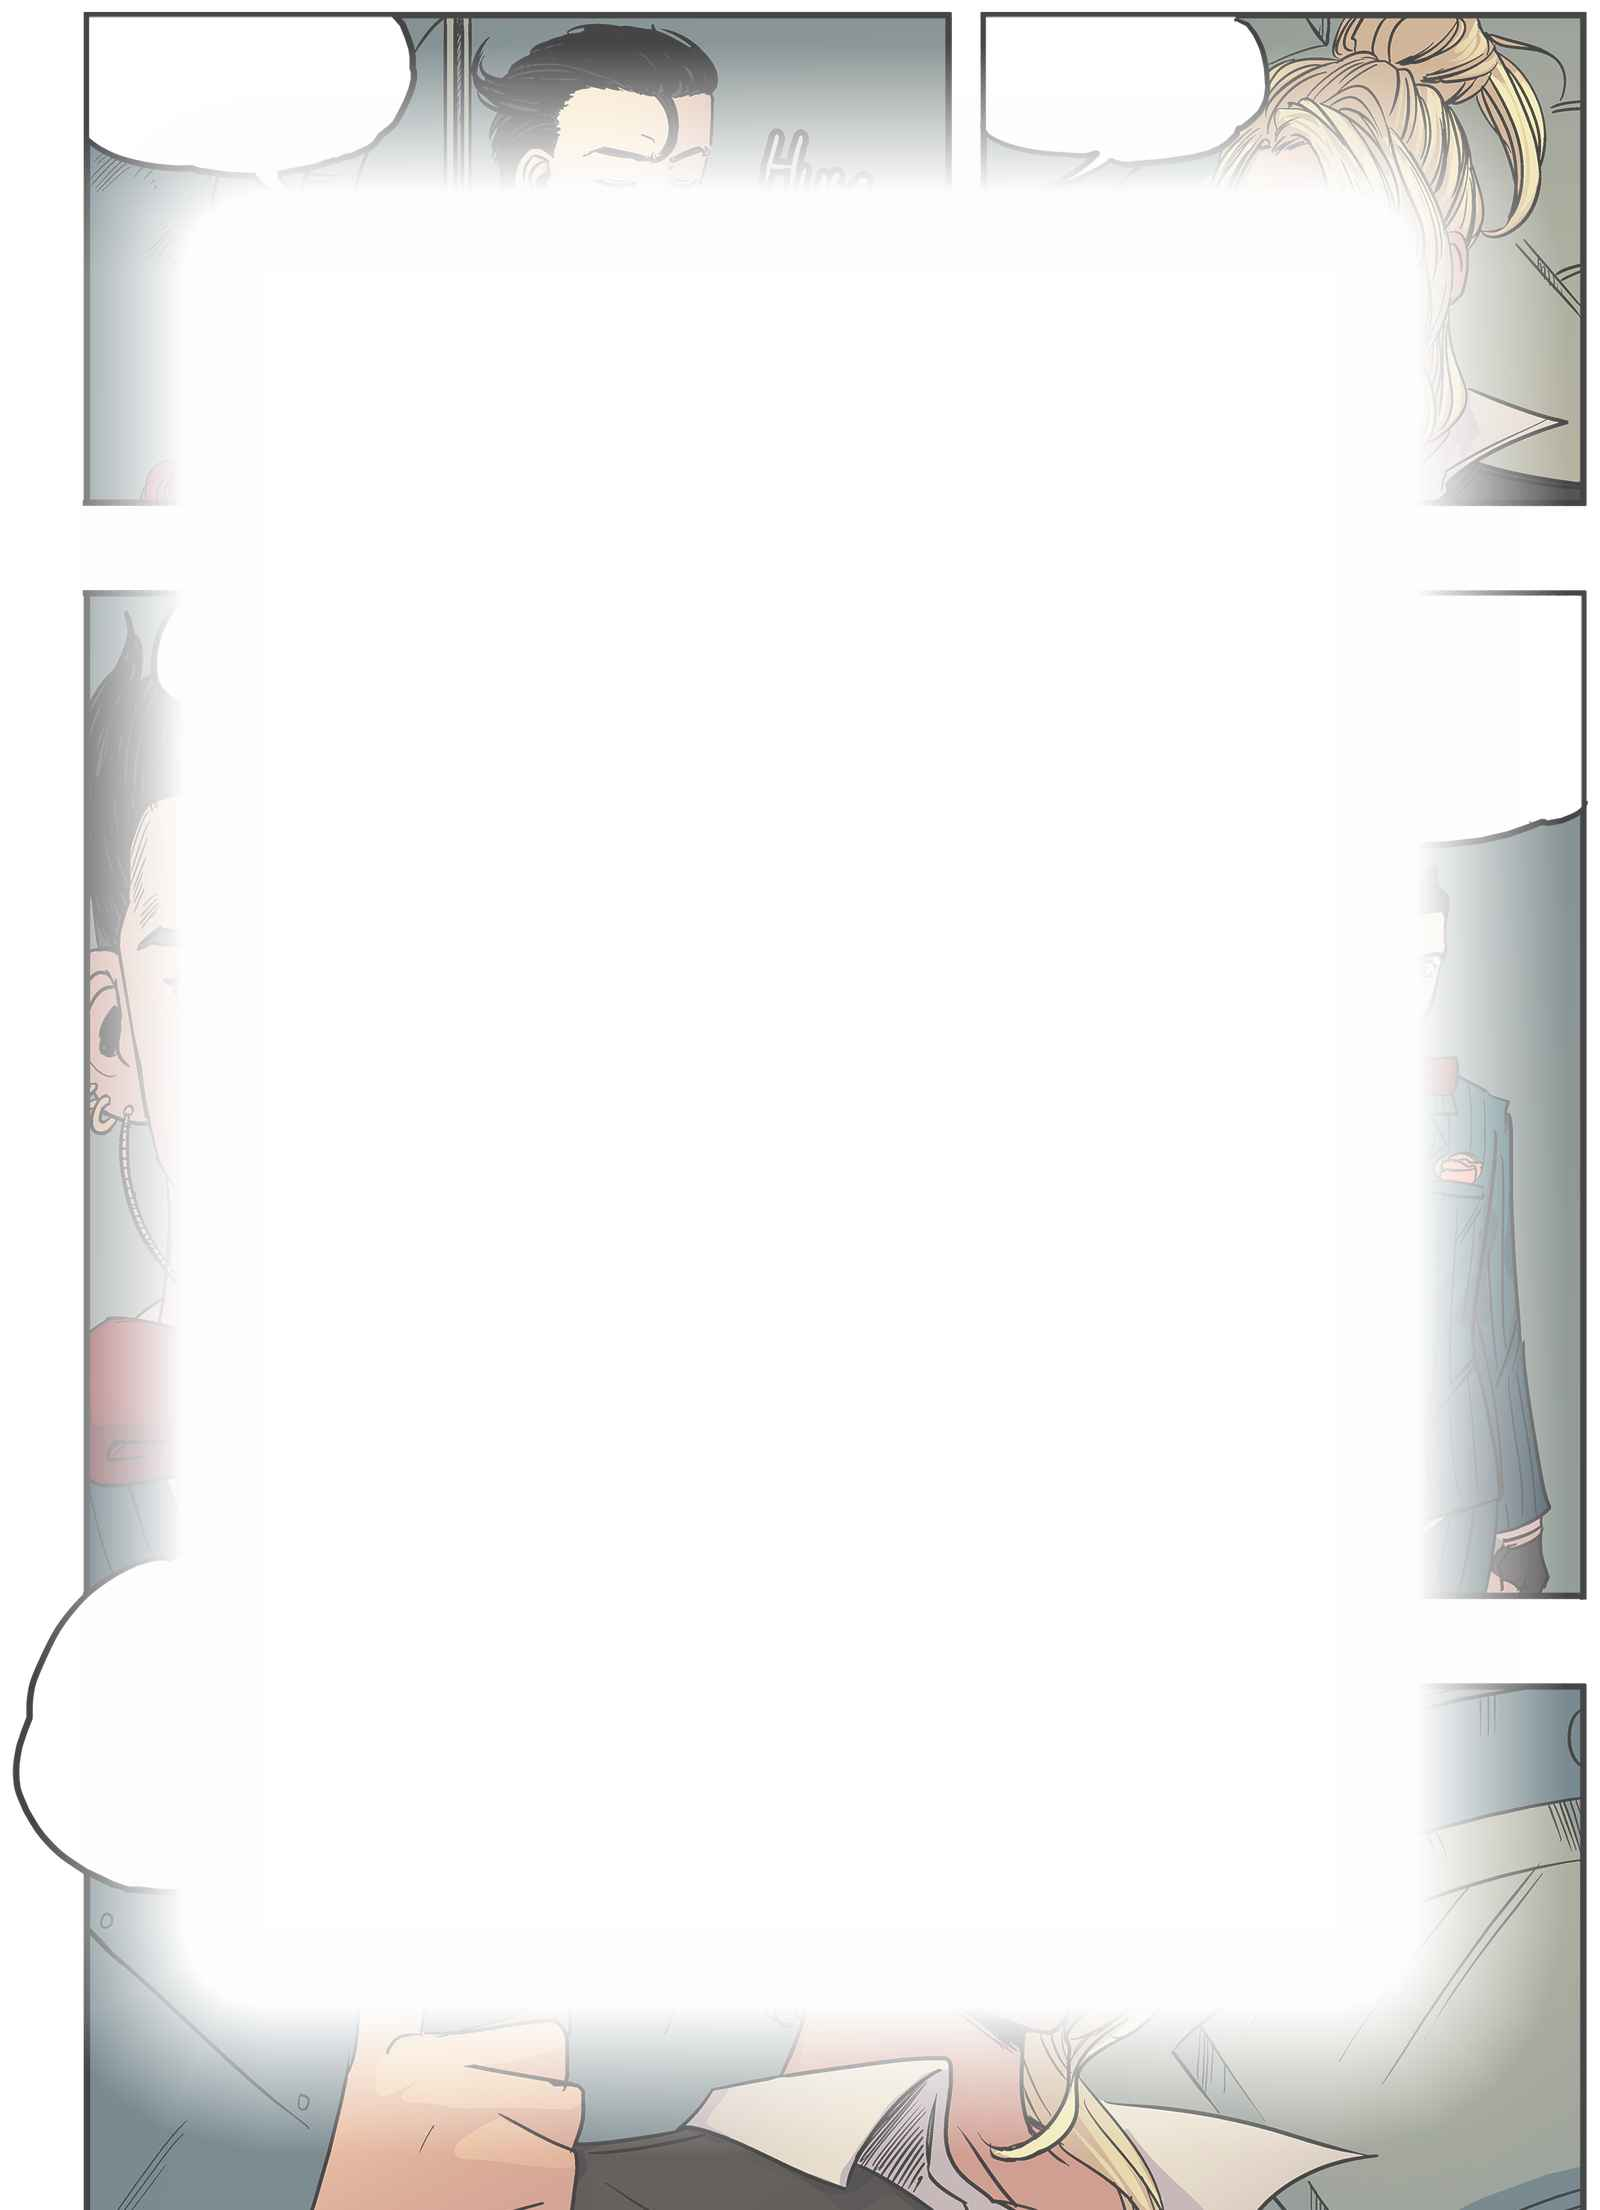 Amilova : Chapitre 7 page 10